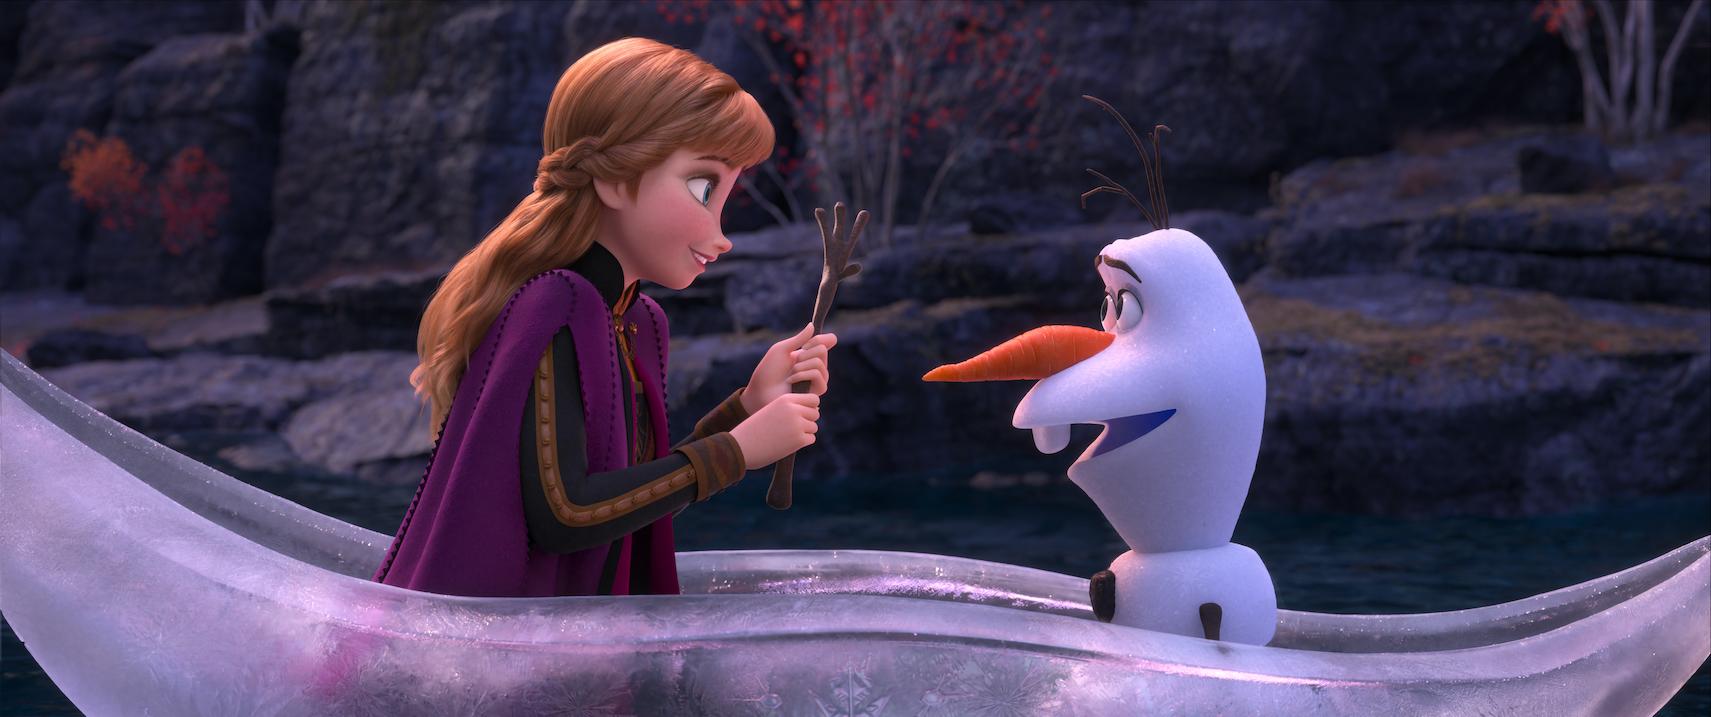 Frozen 2 Is A Cooler Darker Different Kind Of Sequel